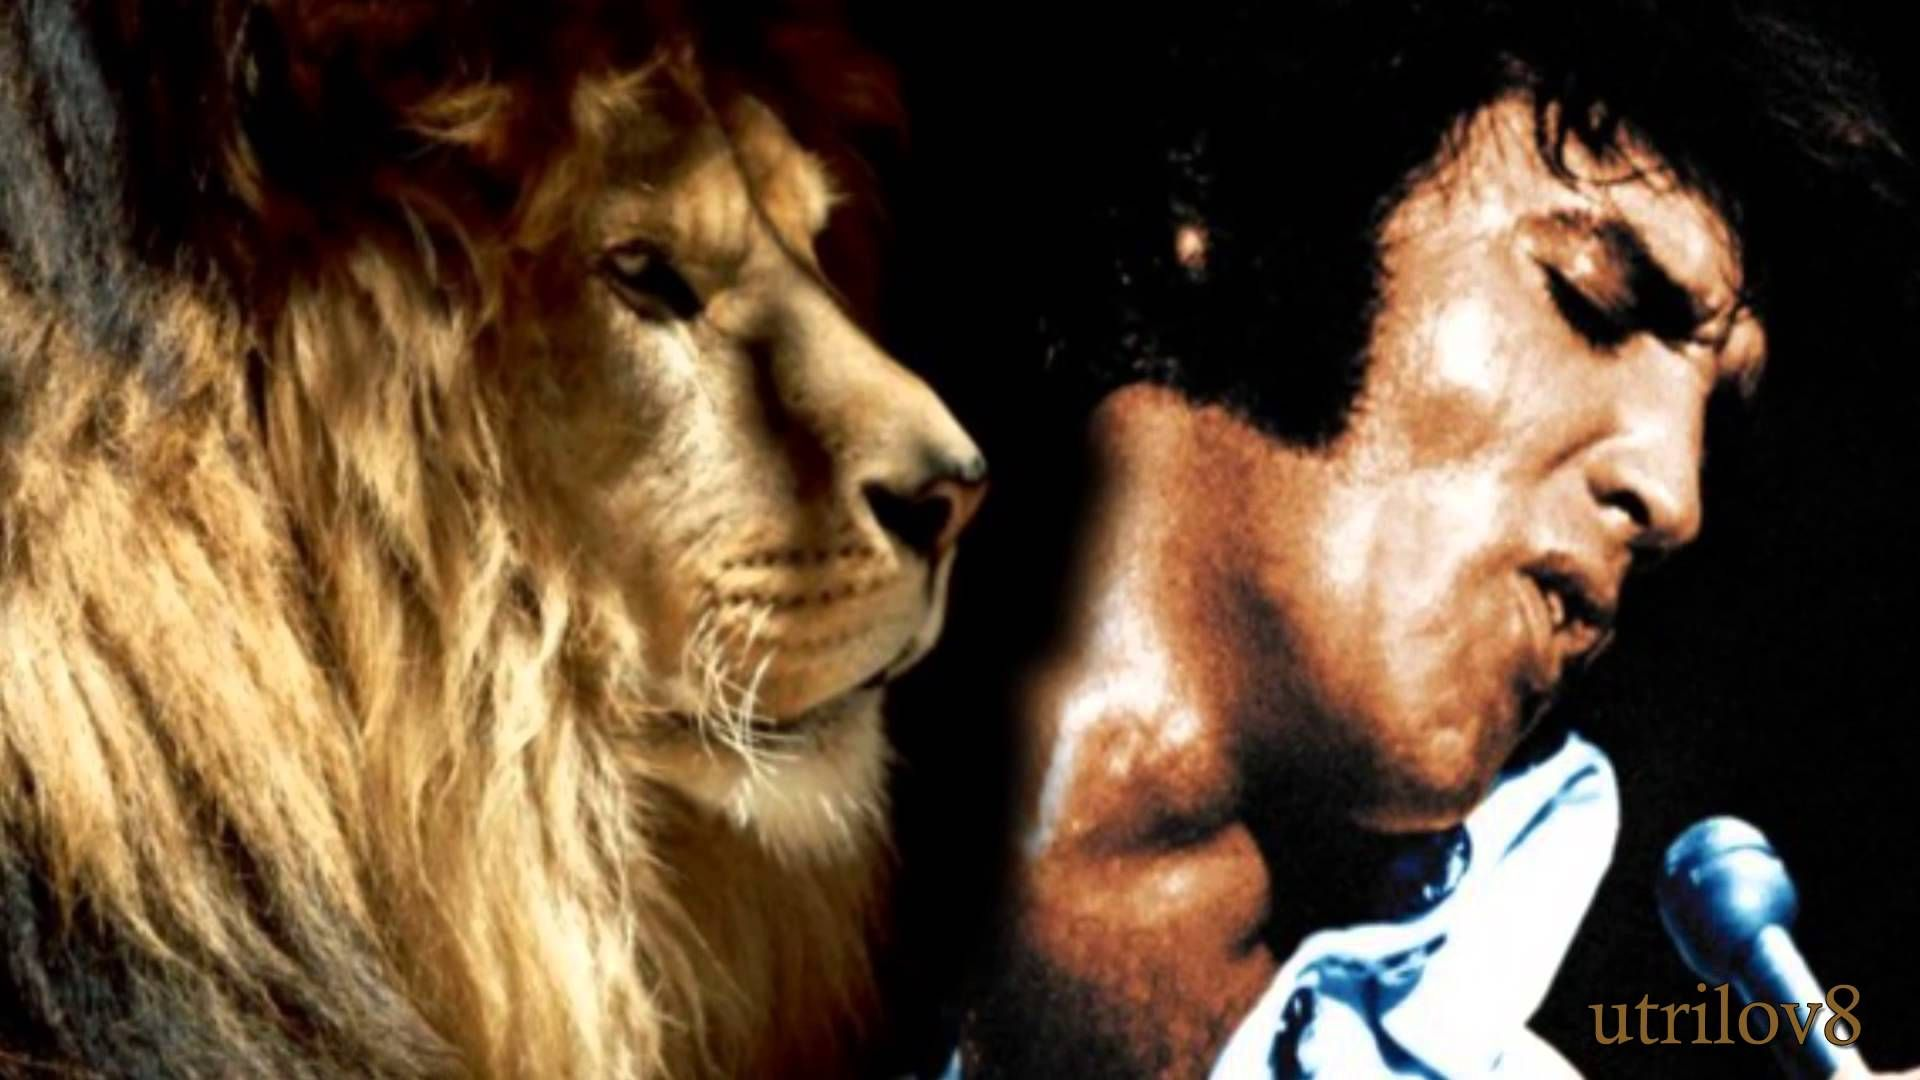 Elvis Presley Animal Instinct (Alternate Master) With